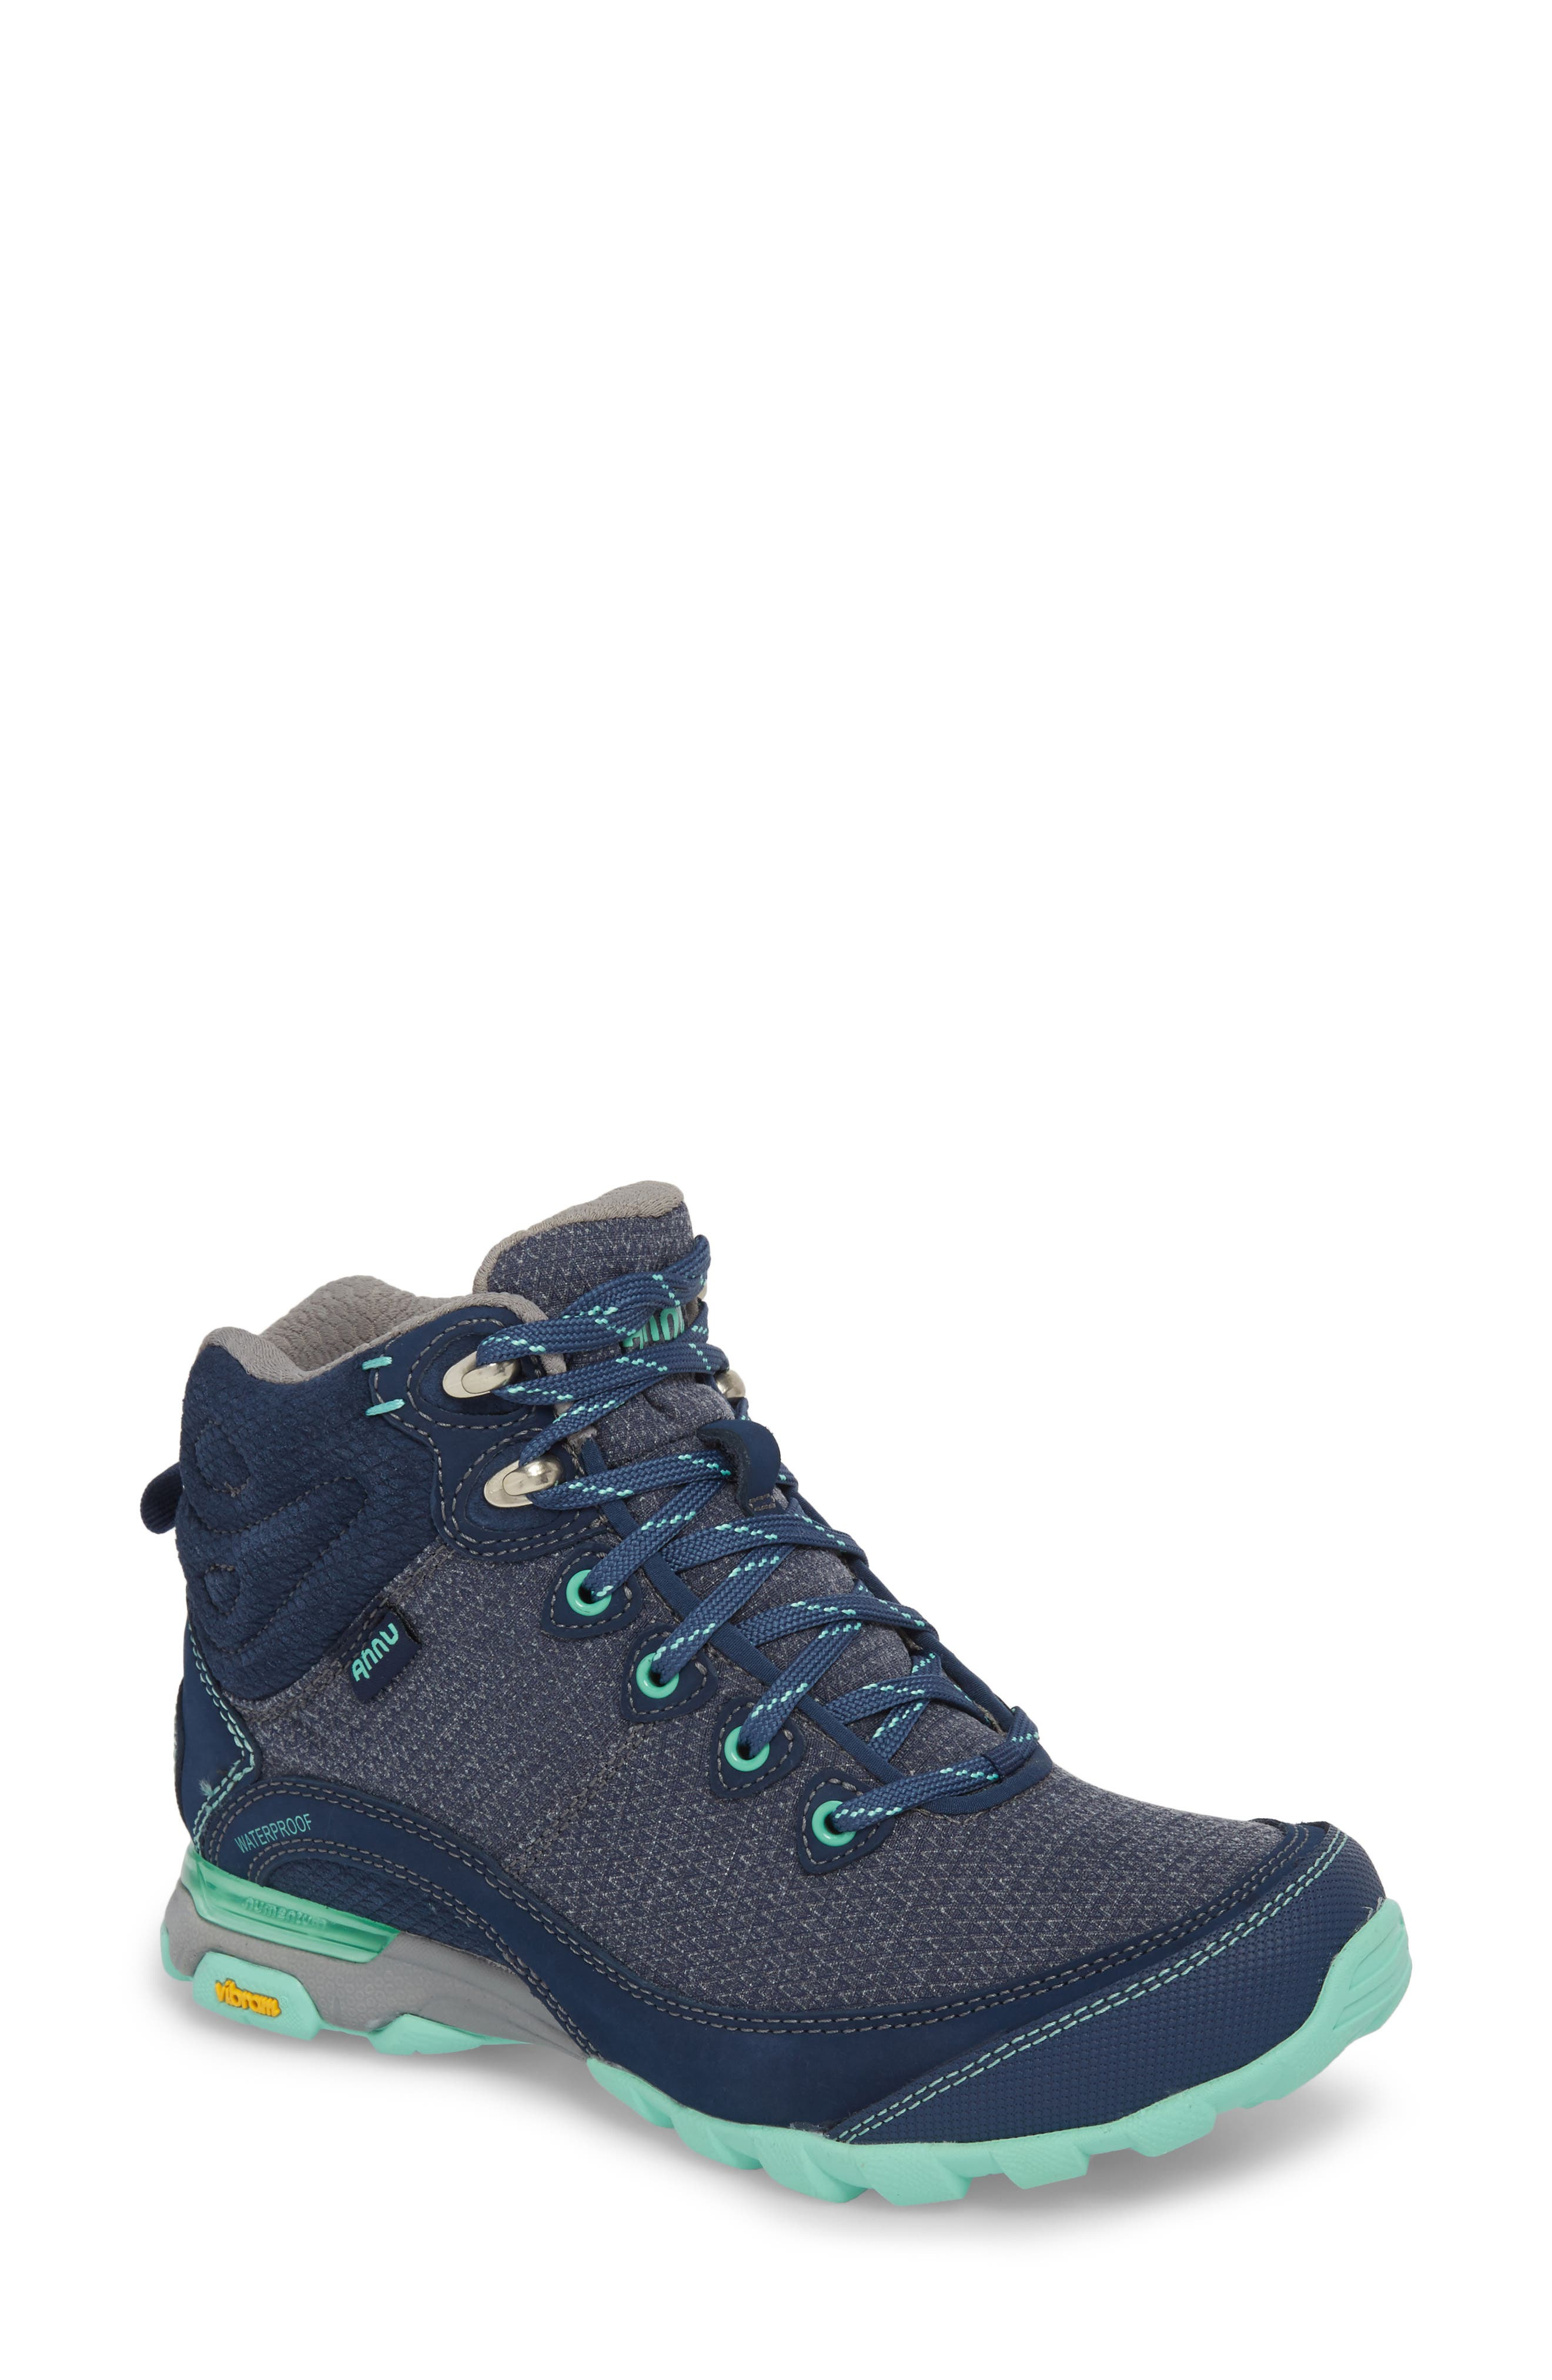 TEVA, Ahnu by Teva Sugarpine II Waterproof Hiking Boot, Main thumbnail 1, color, INSIGNIA BLUE